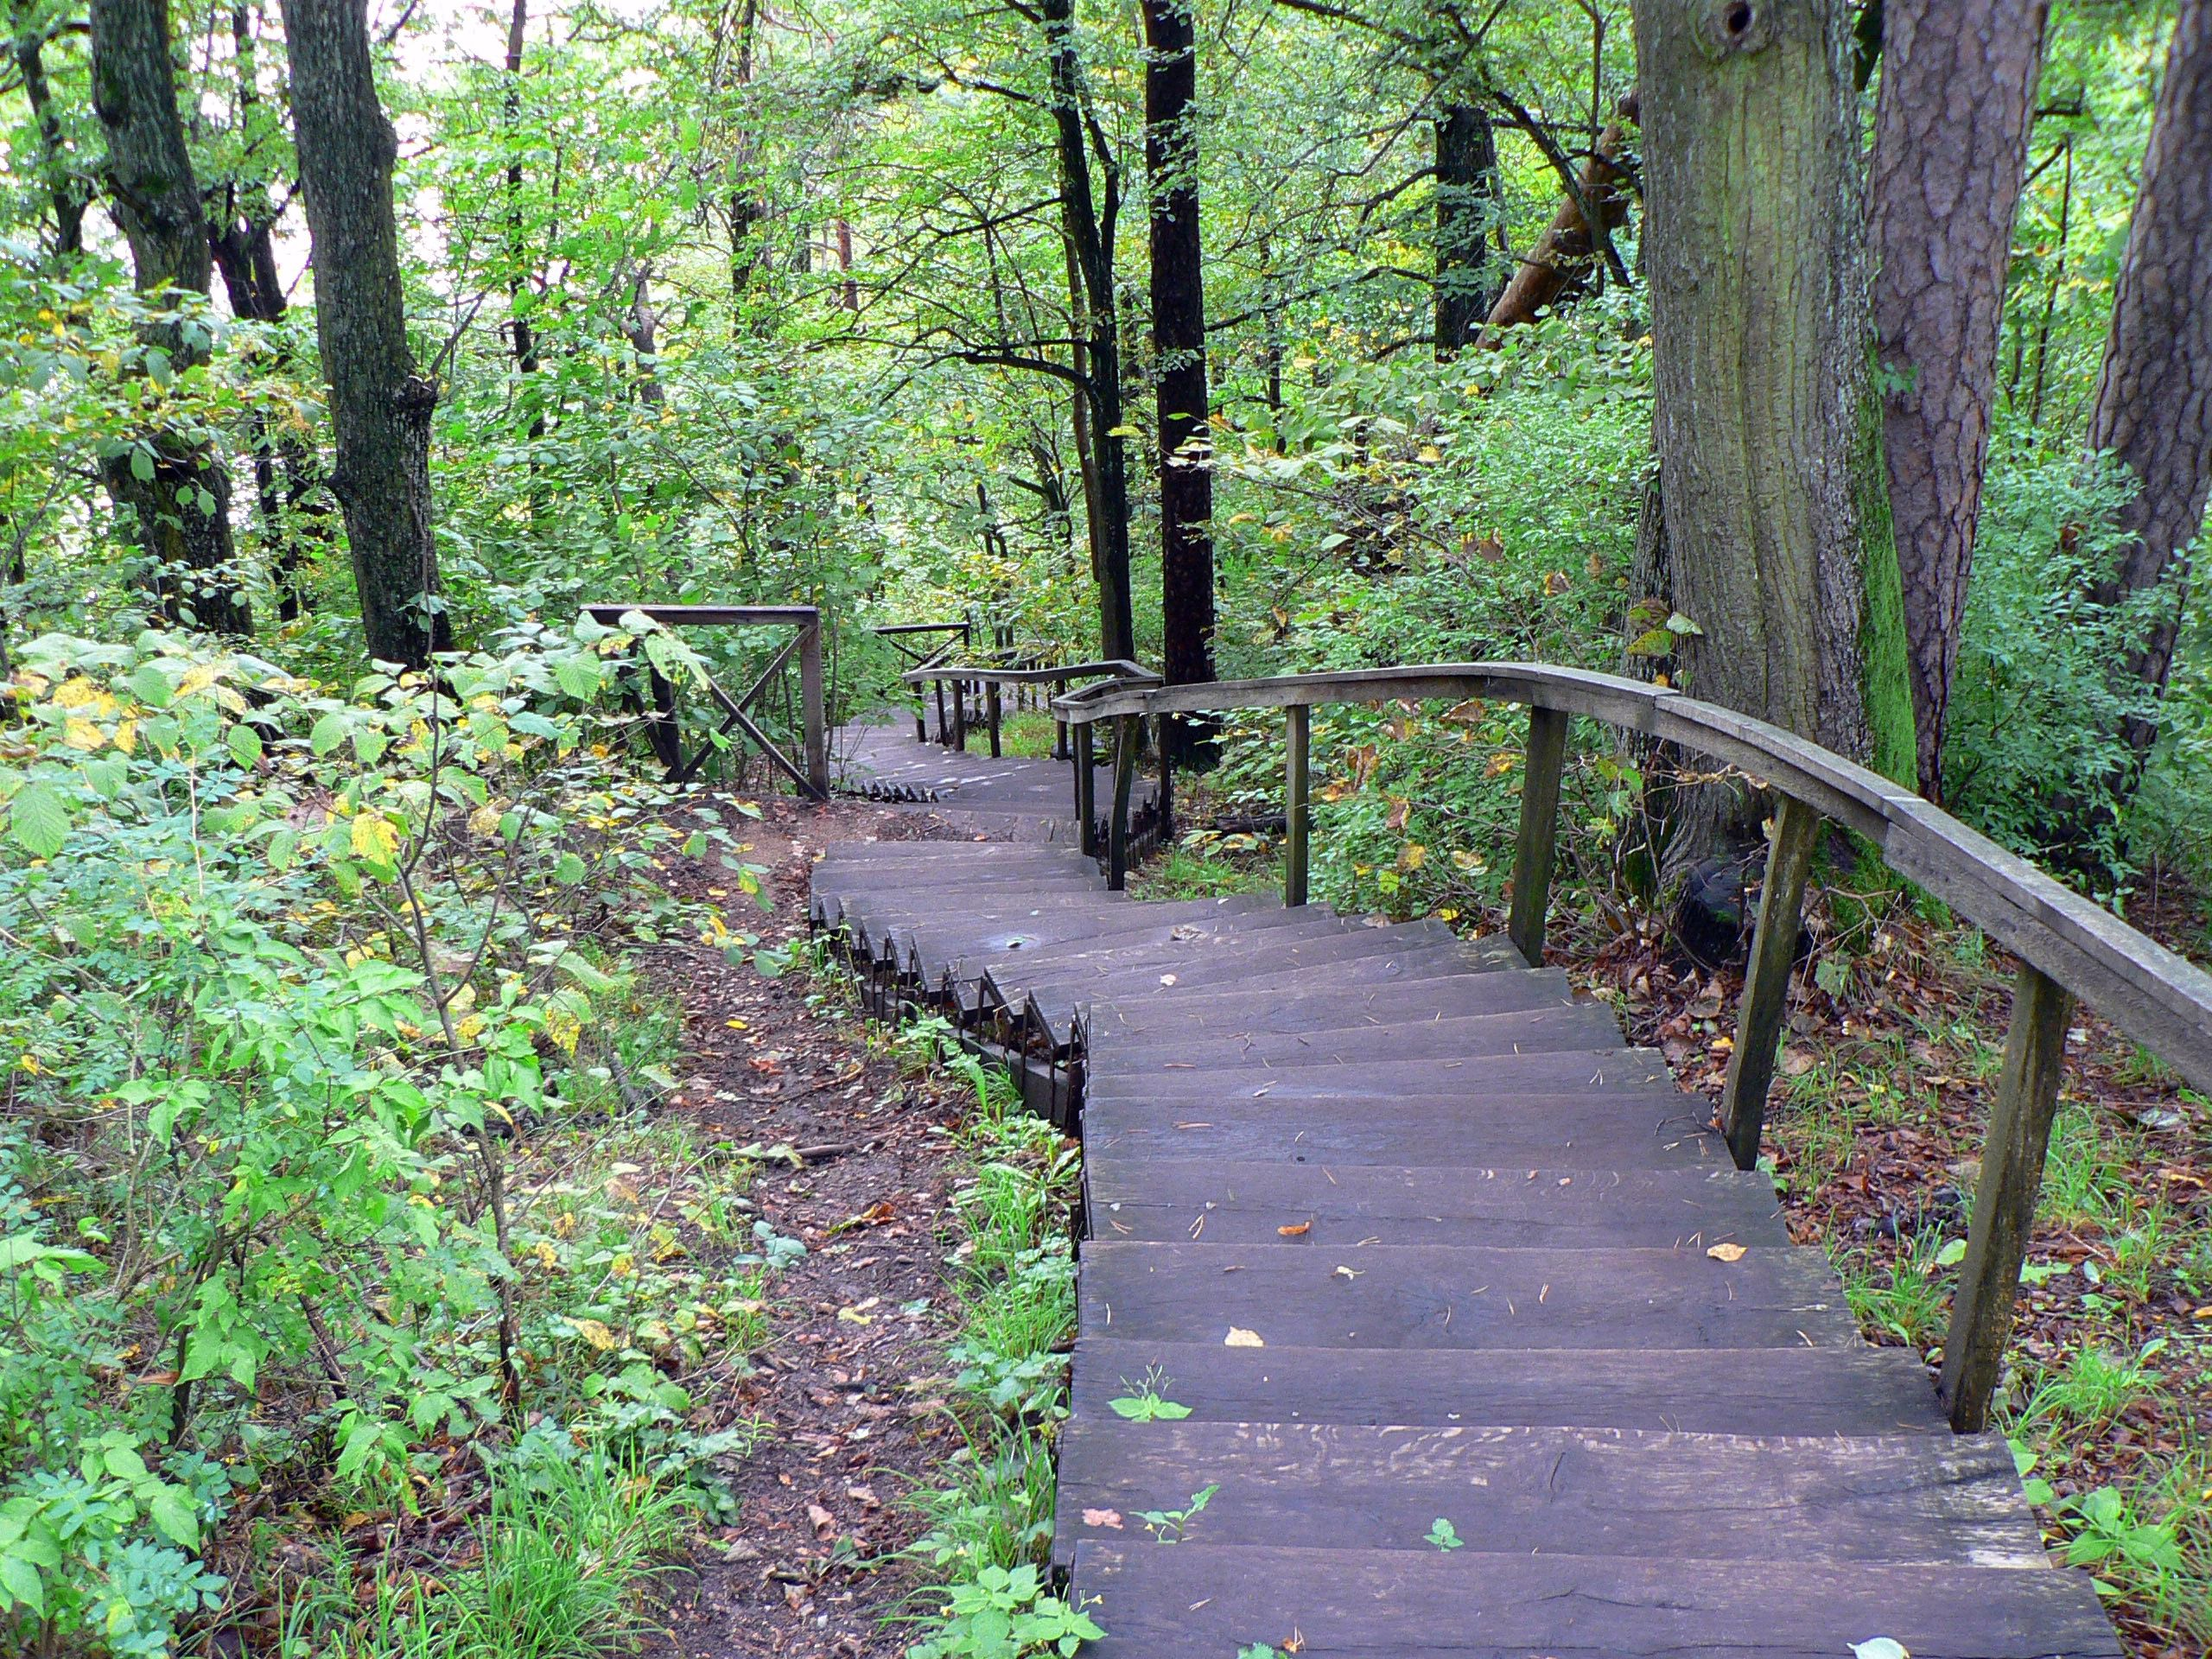 The Vilnius forest